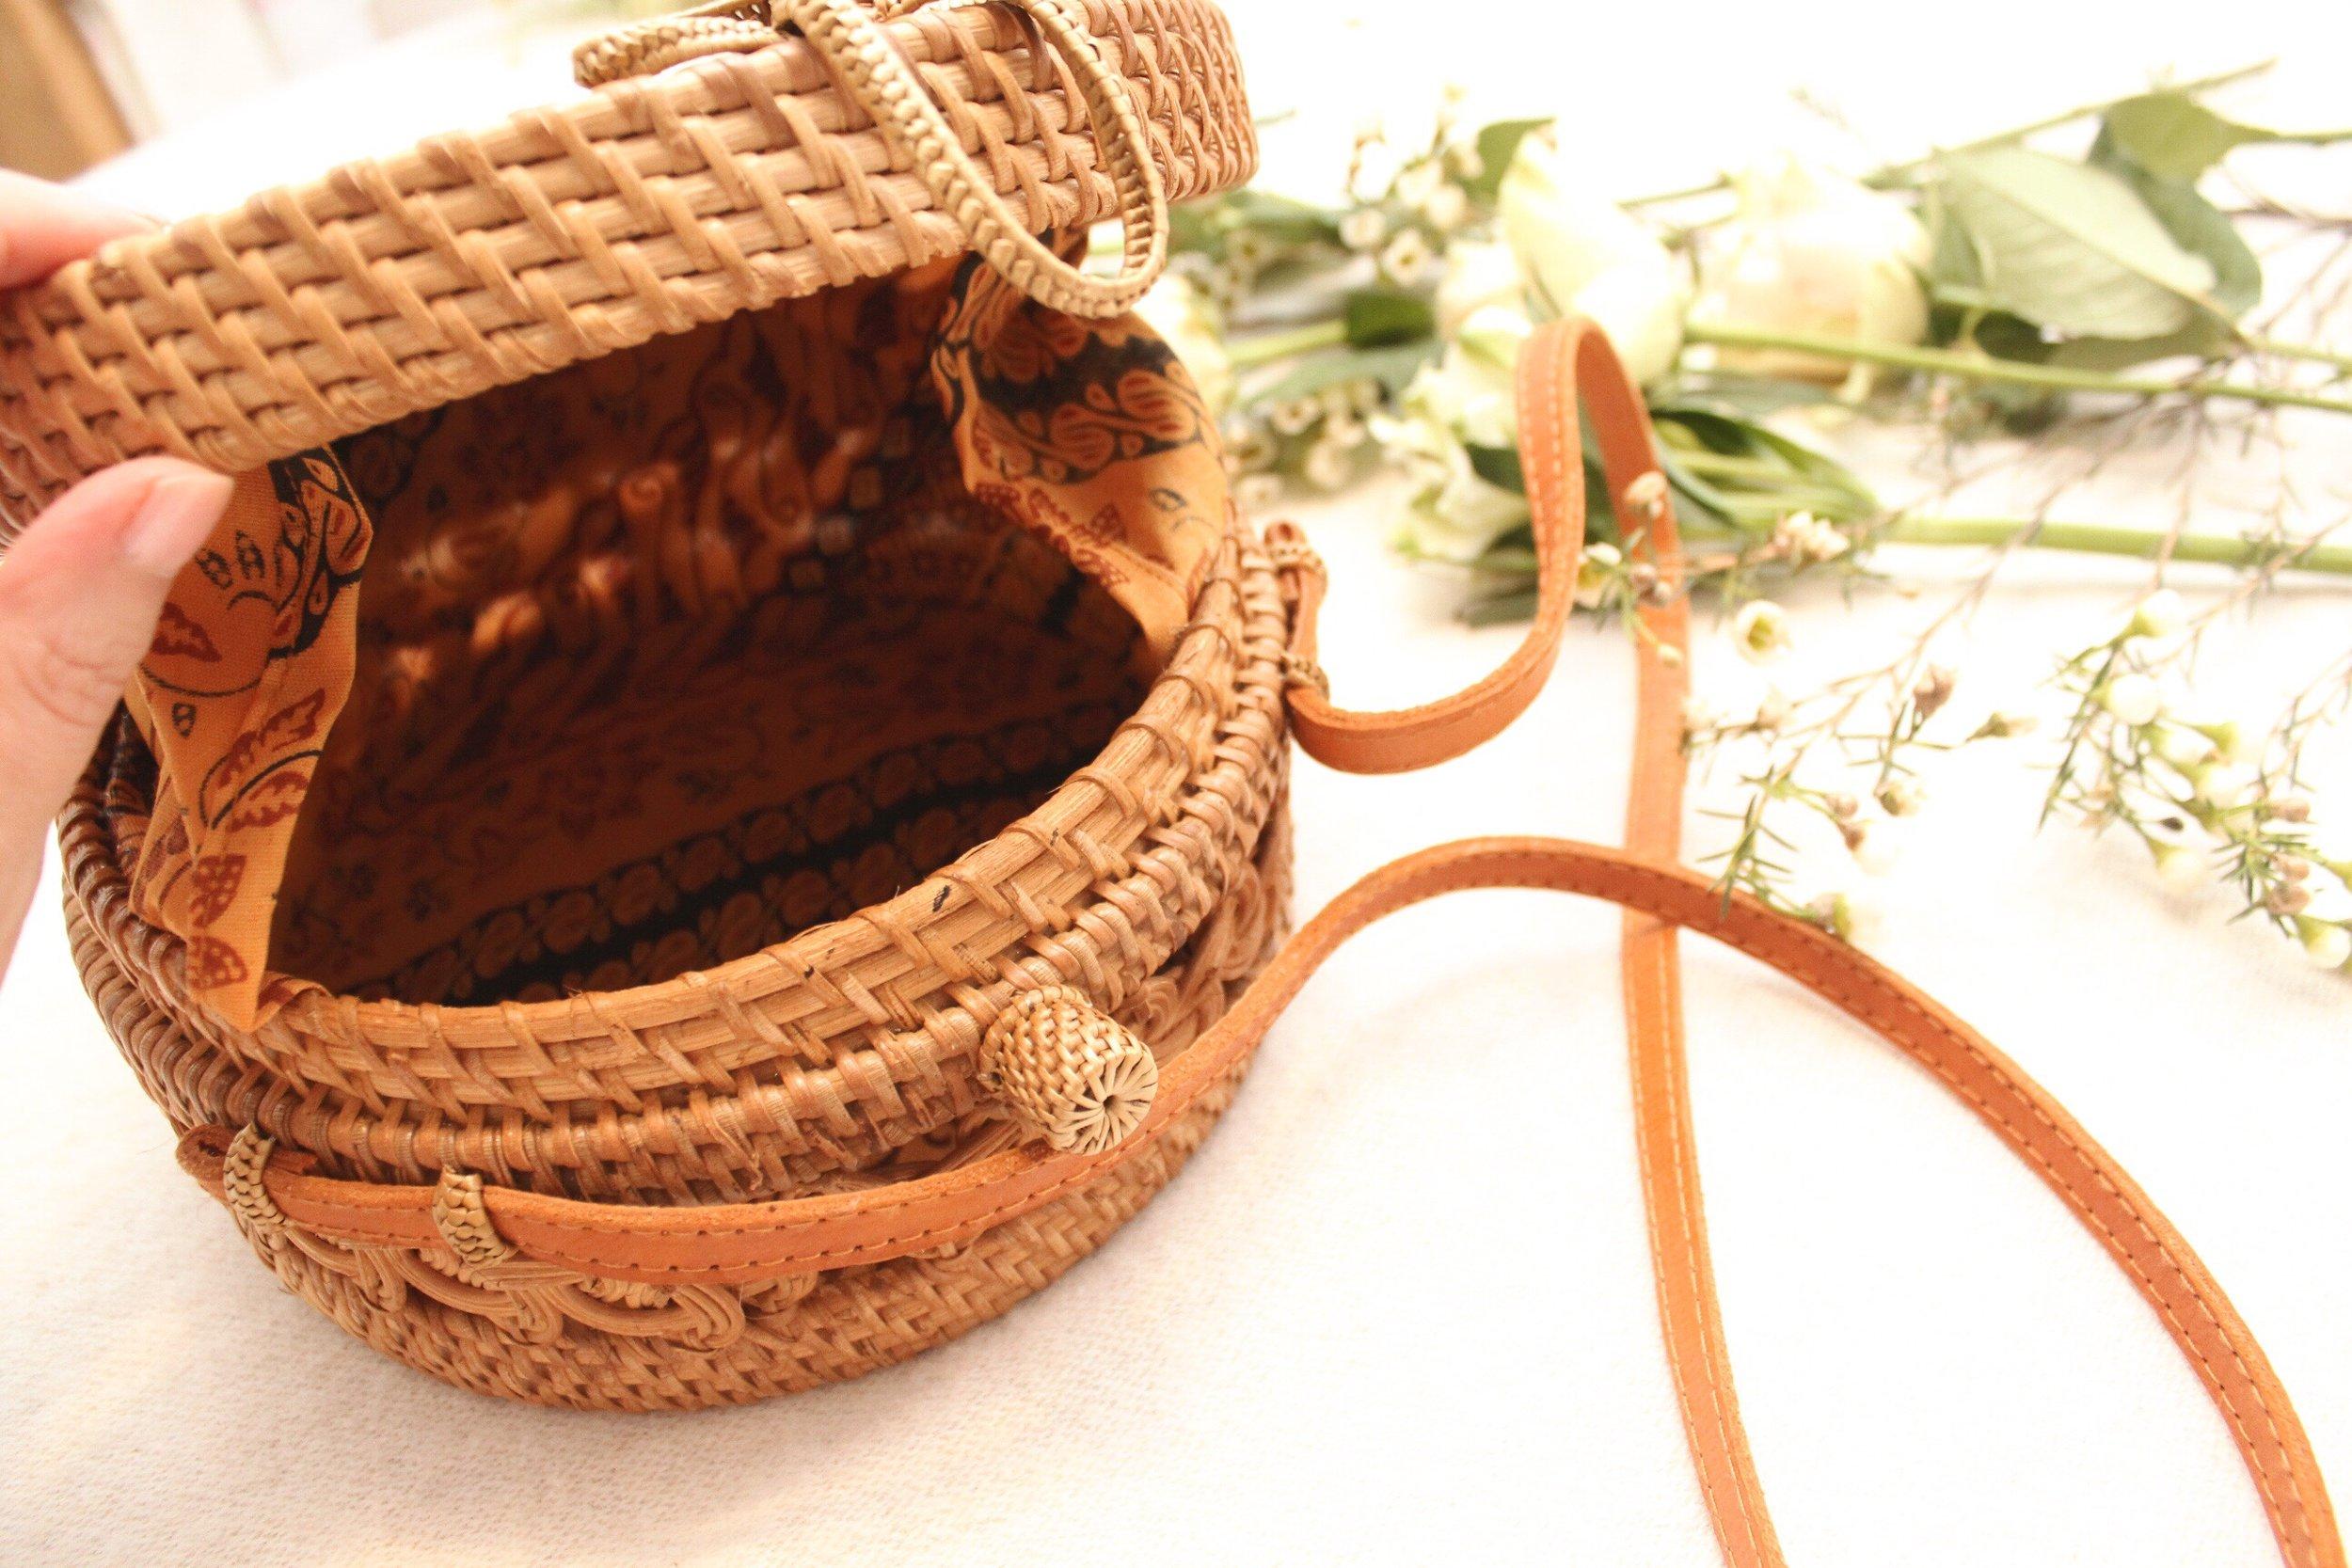 Round Basket Bag Styles for Summer.JPG